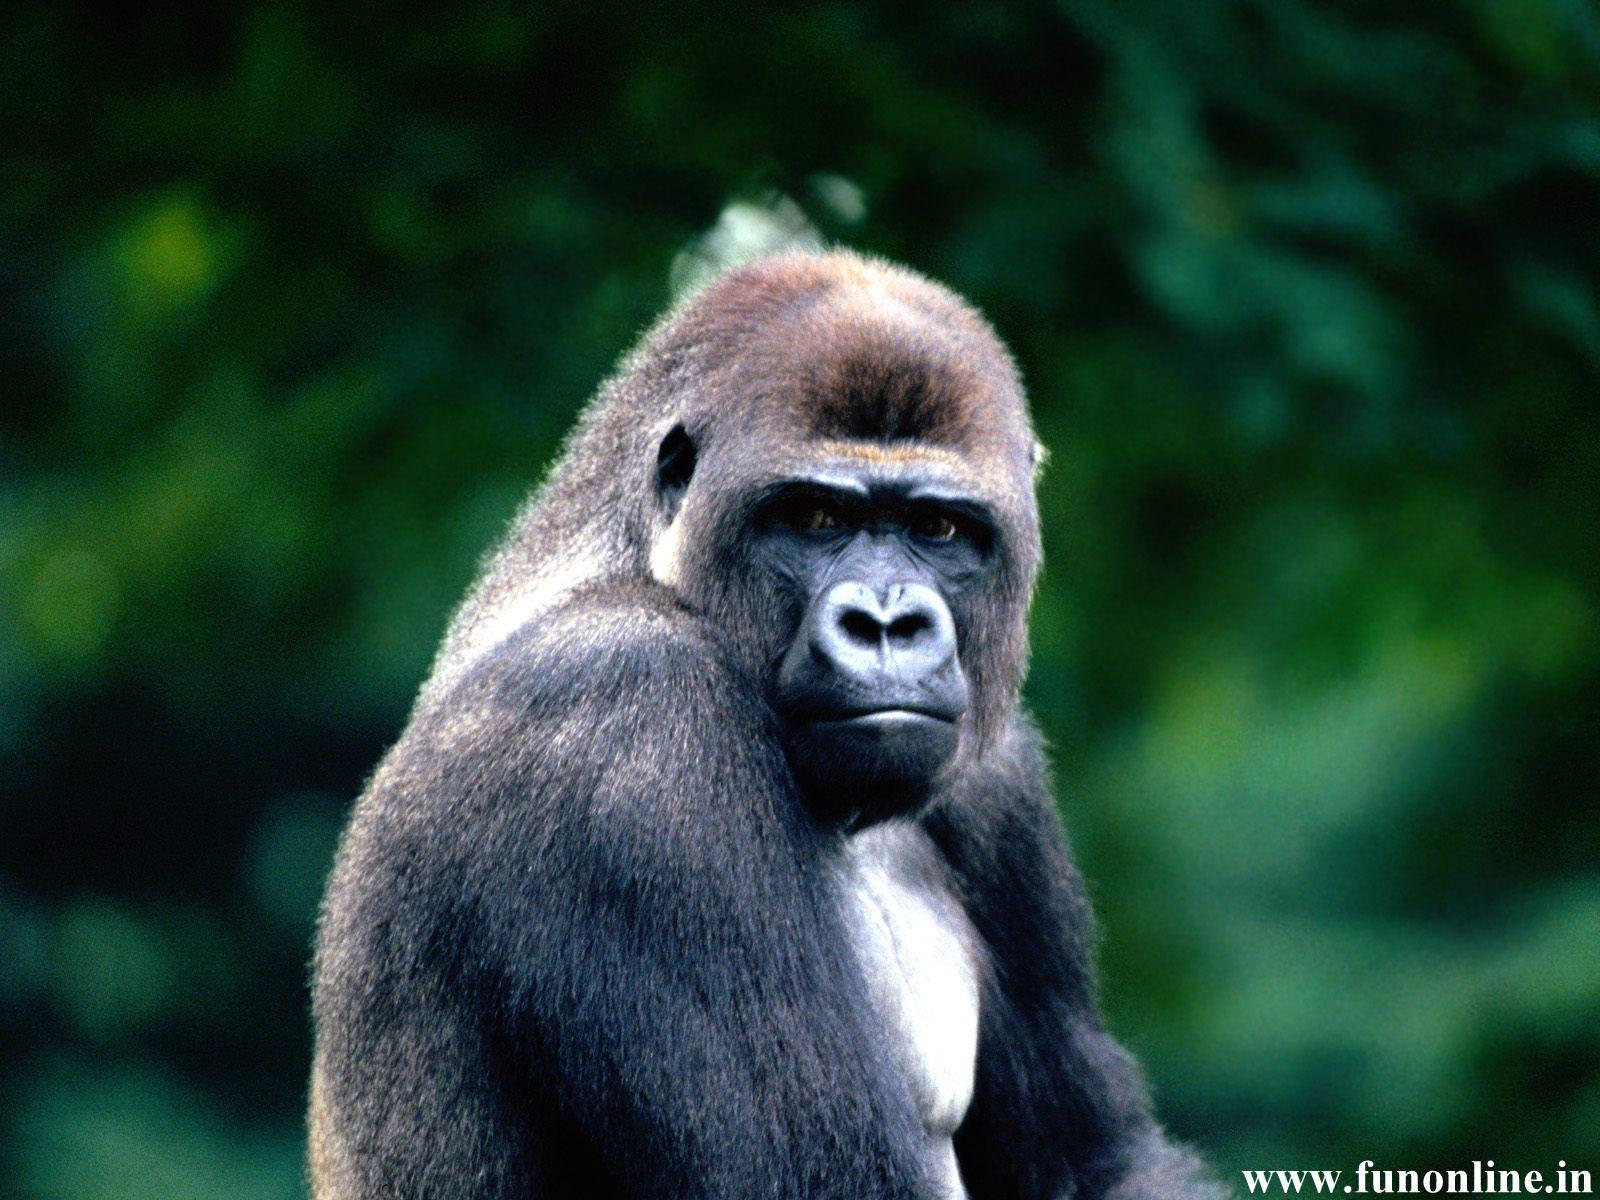 Gorilla Wallpapers Download Giant Gorillas HD Wallpaper 1600x1200